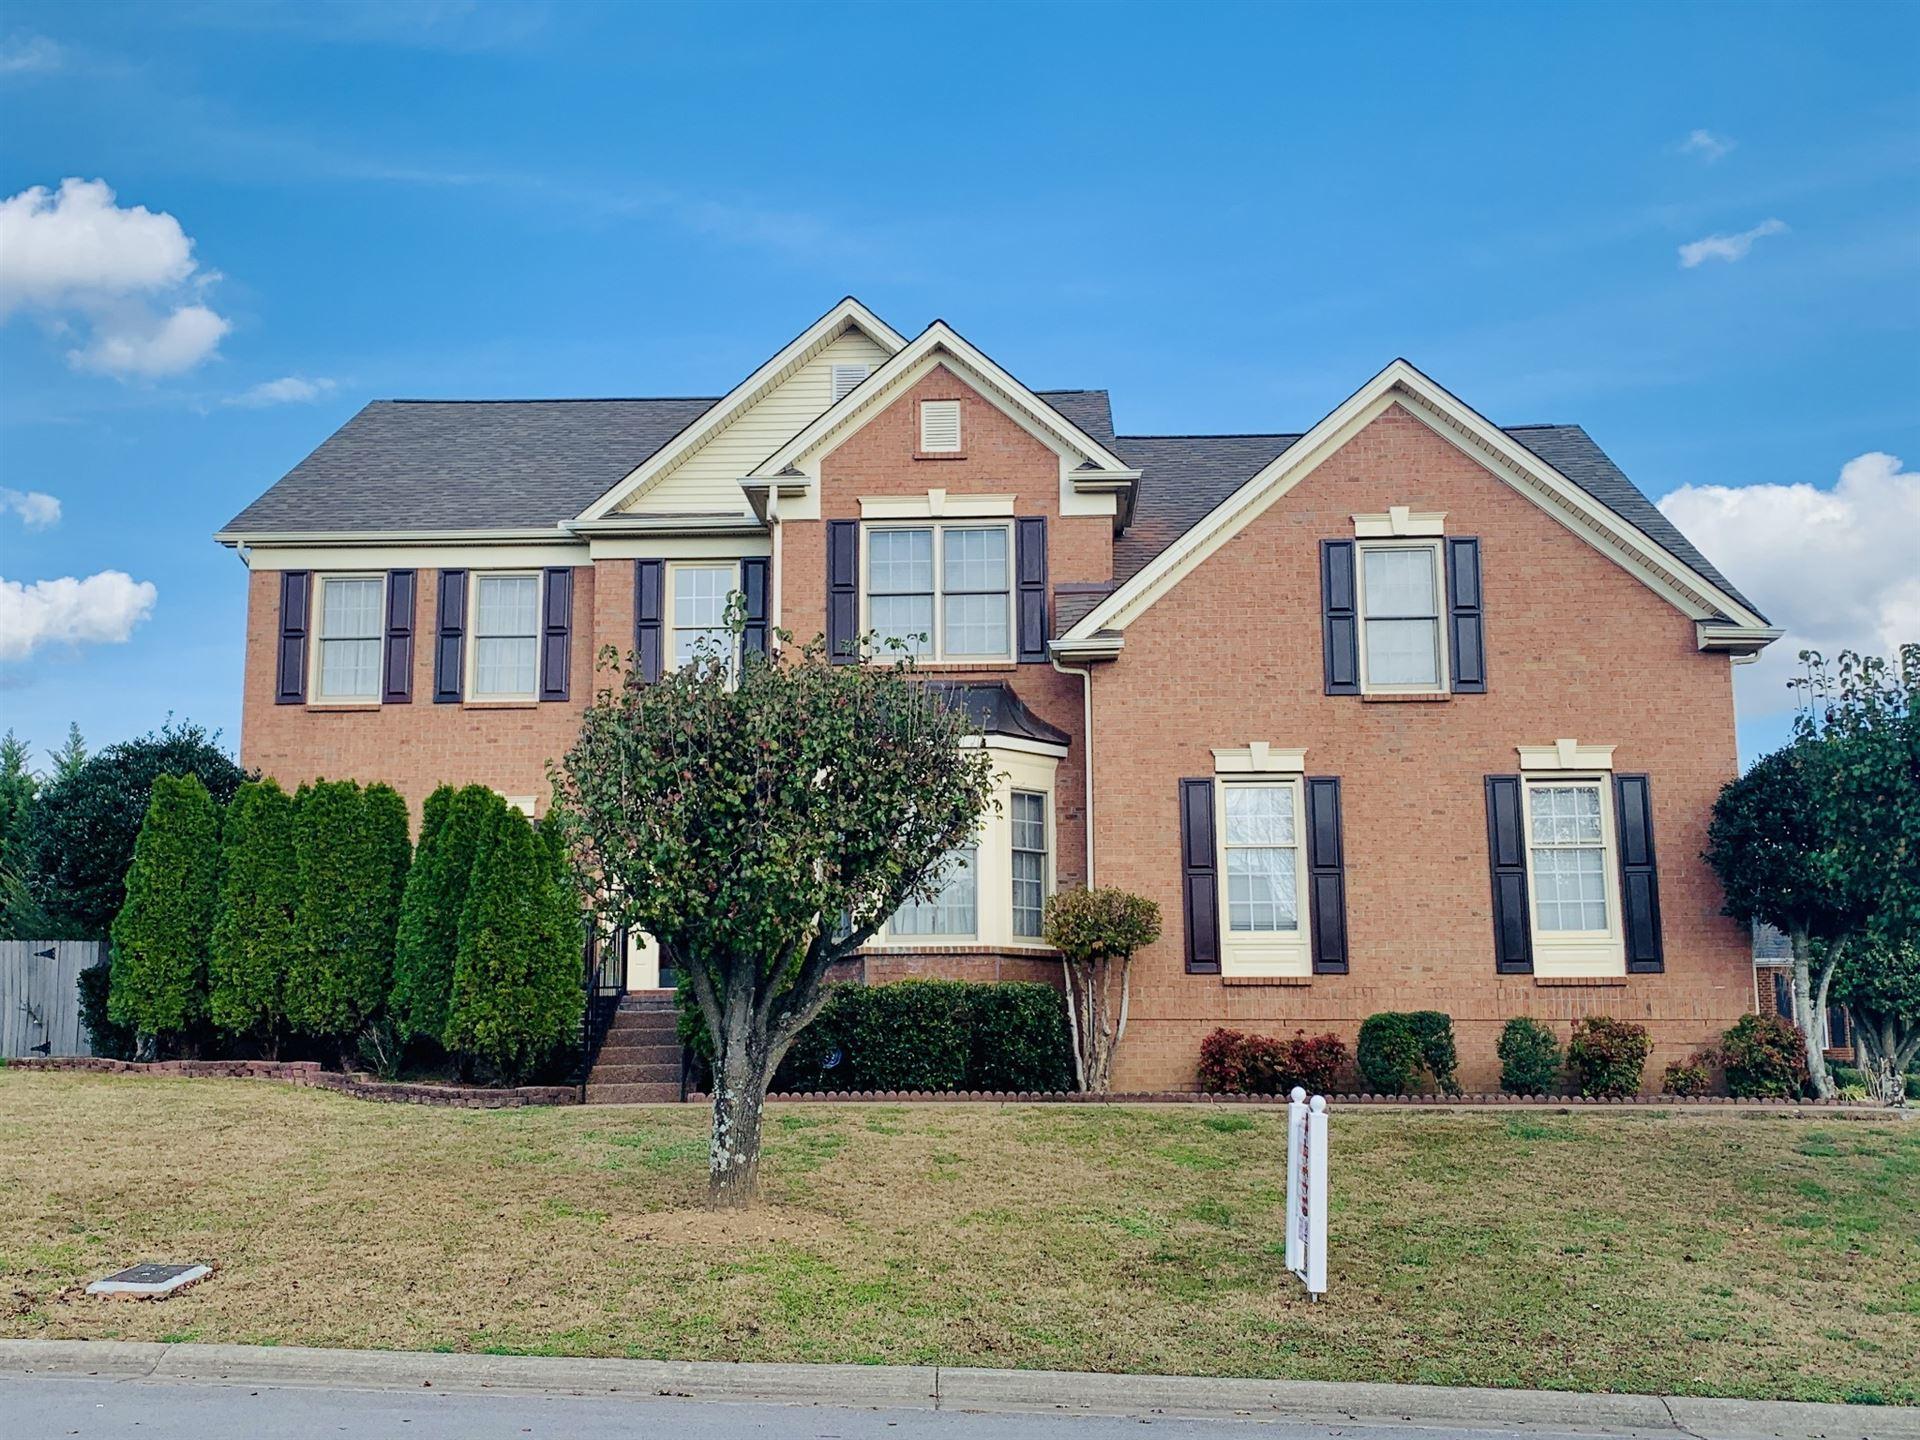 205 Watauga Pl, Brentwood, TN 37027 - MLS#: 2248690